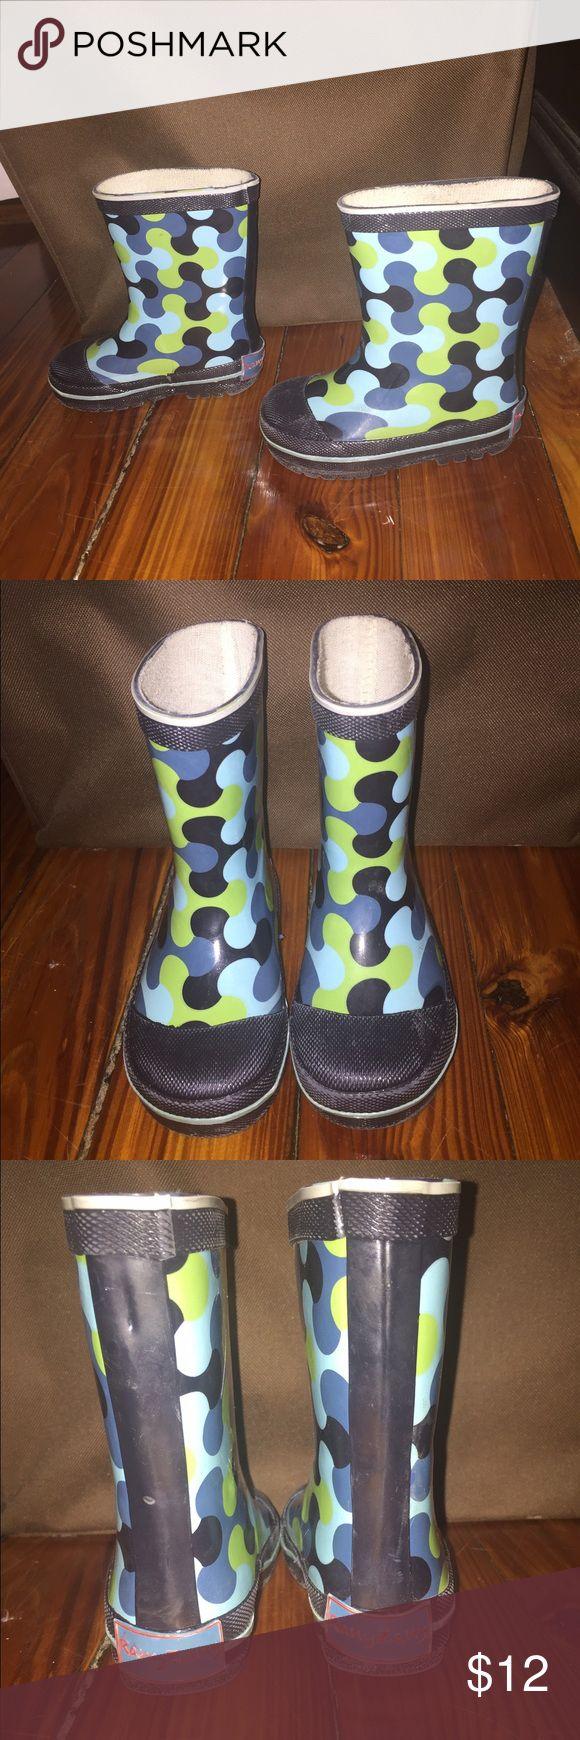 Boys rain boots Boys rain boots size 5 Shoes Rain & Snow Boots